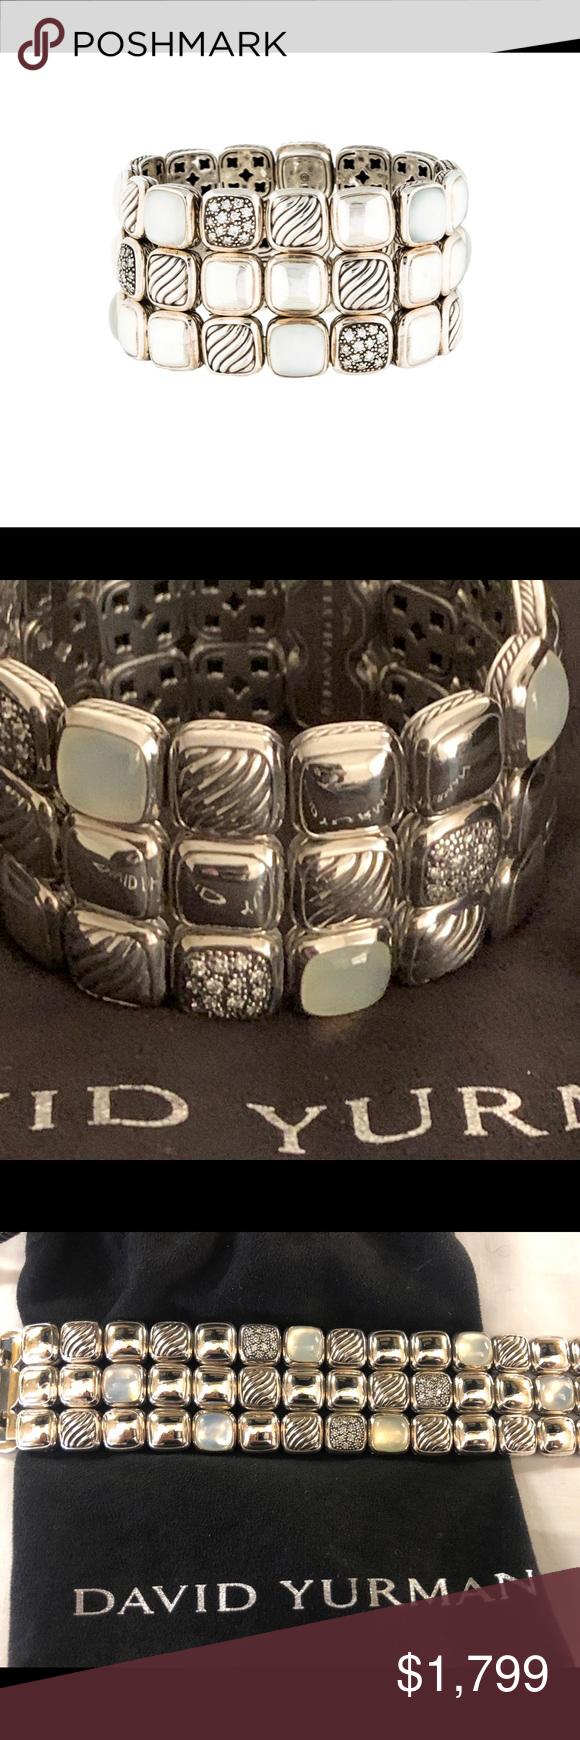 29+ Buy used david yurman jewelry information